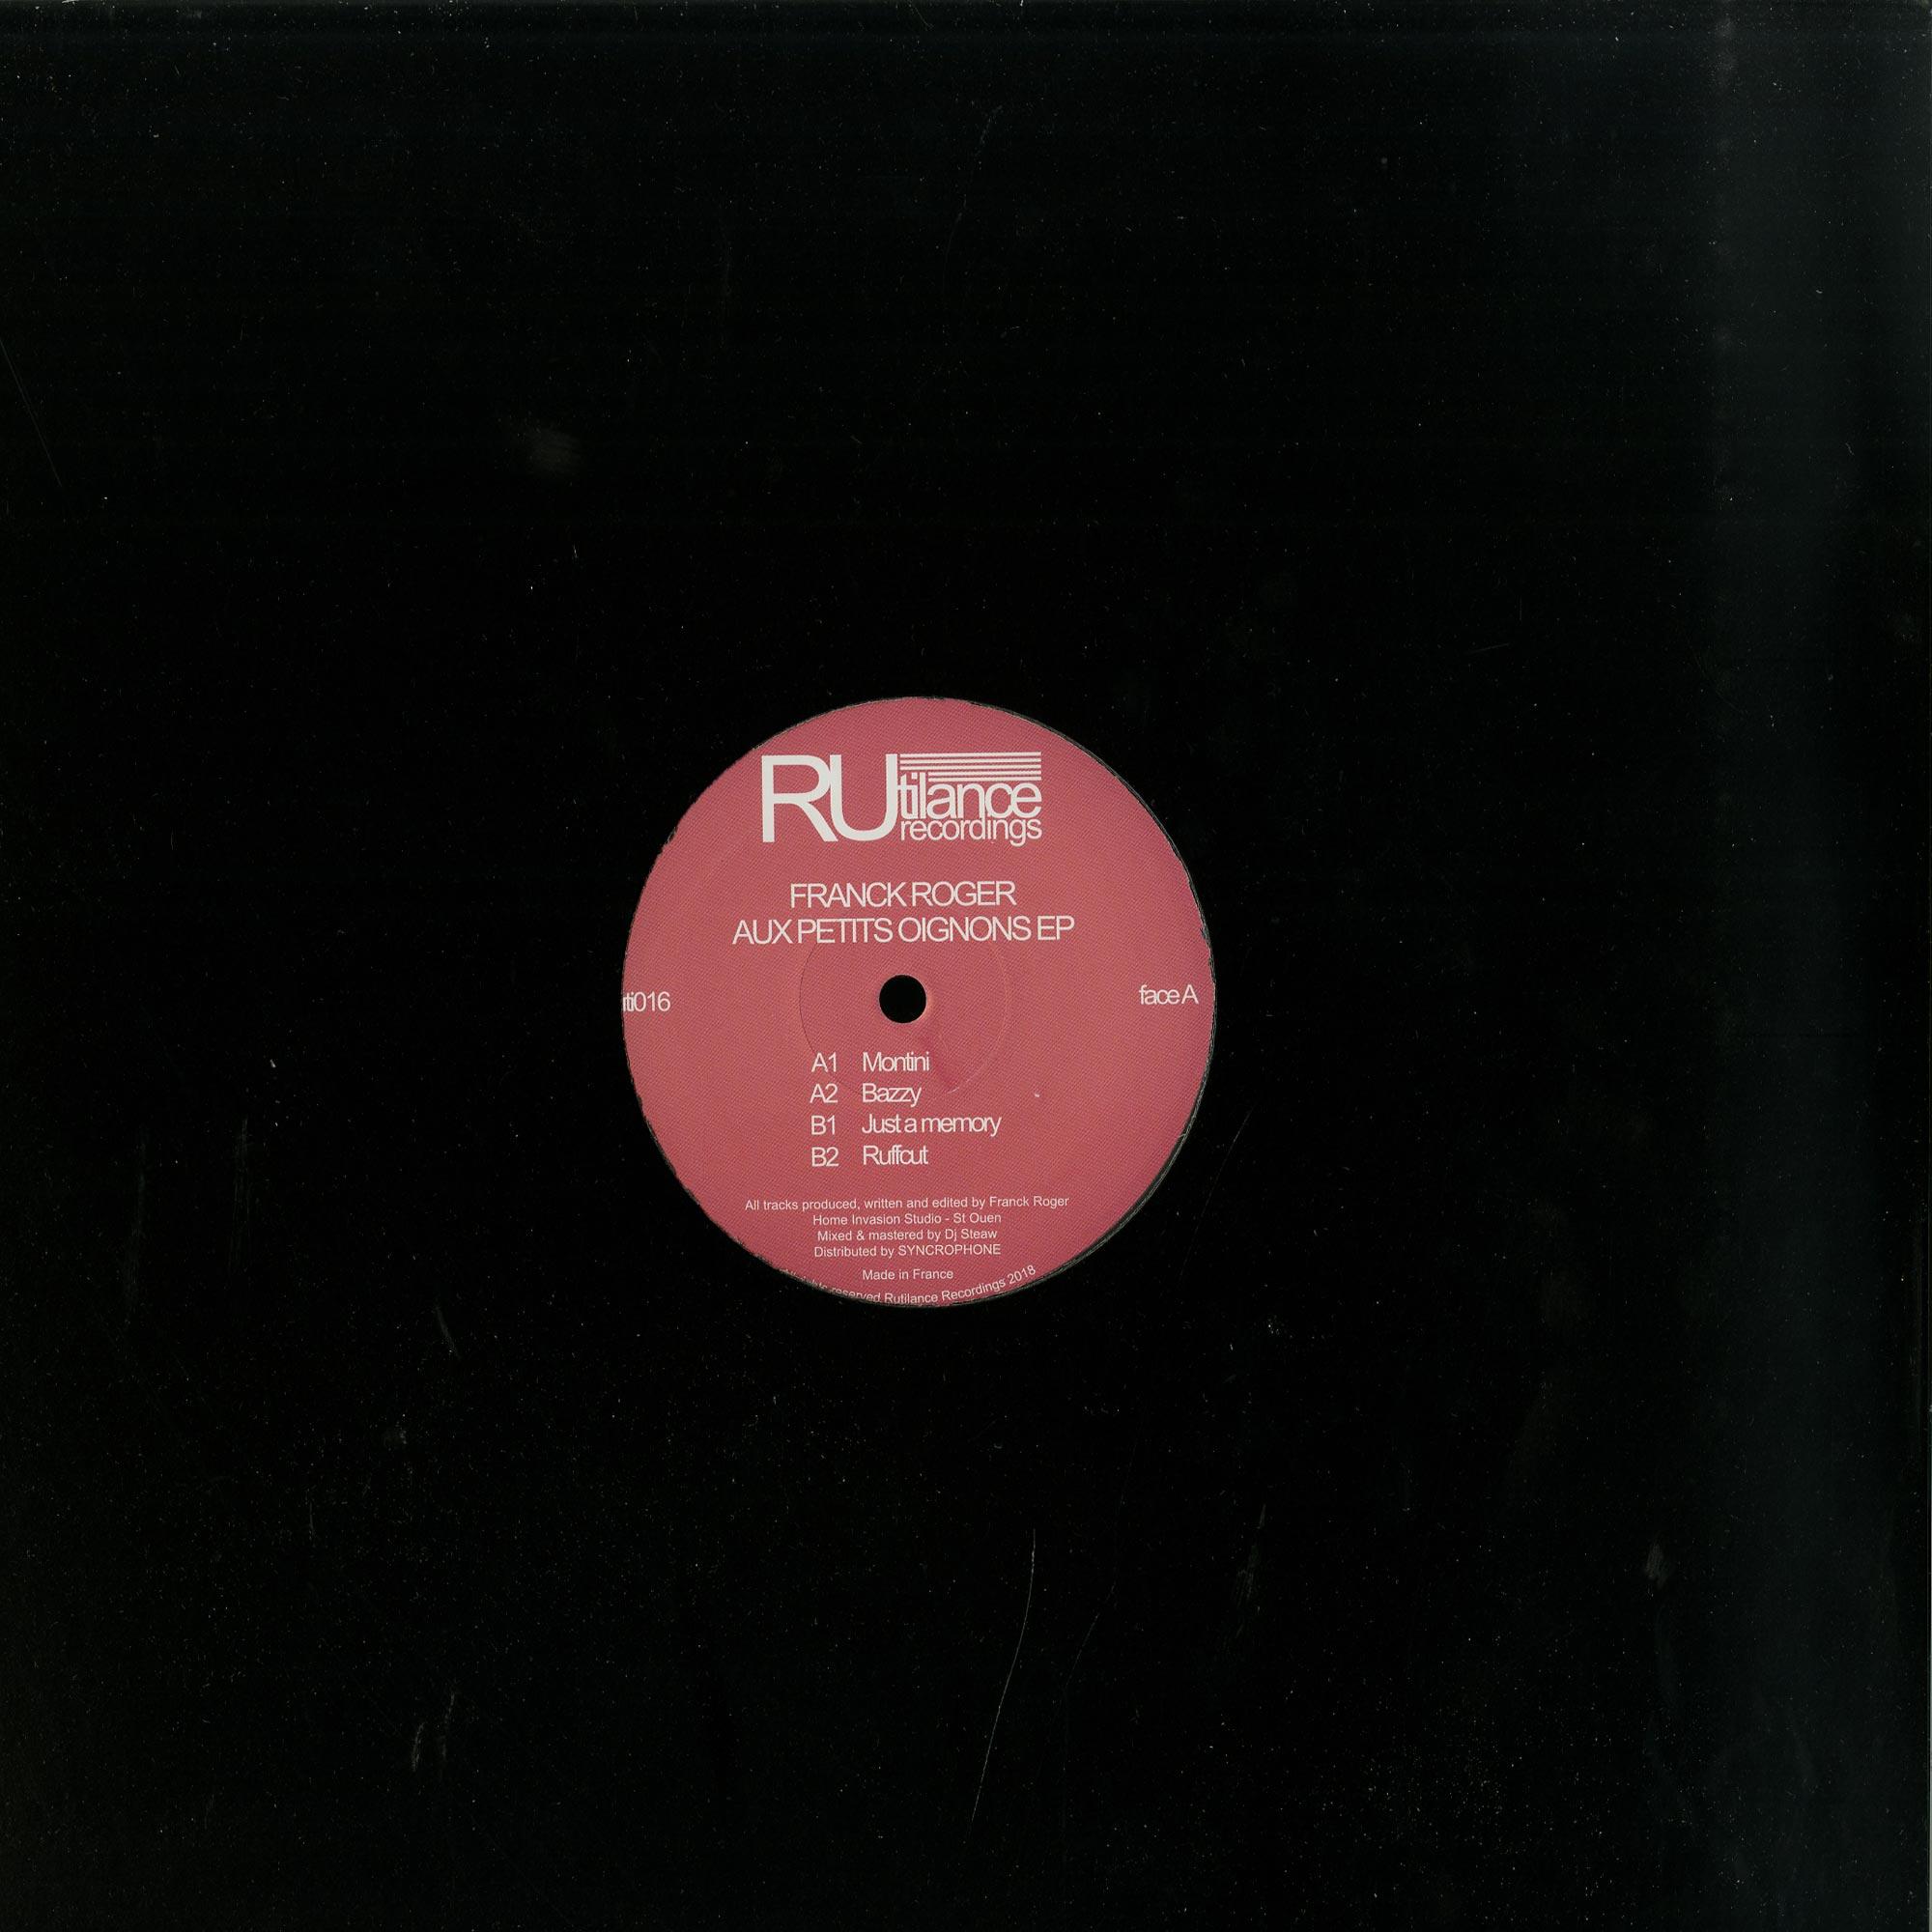 Franck Roger - AUX PETITS OIGNONS EP